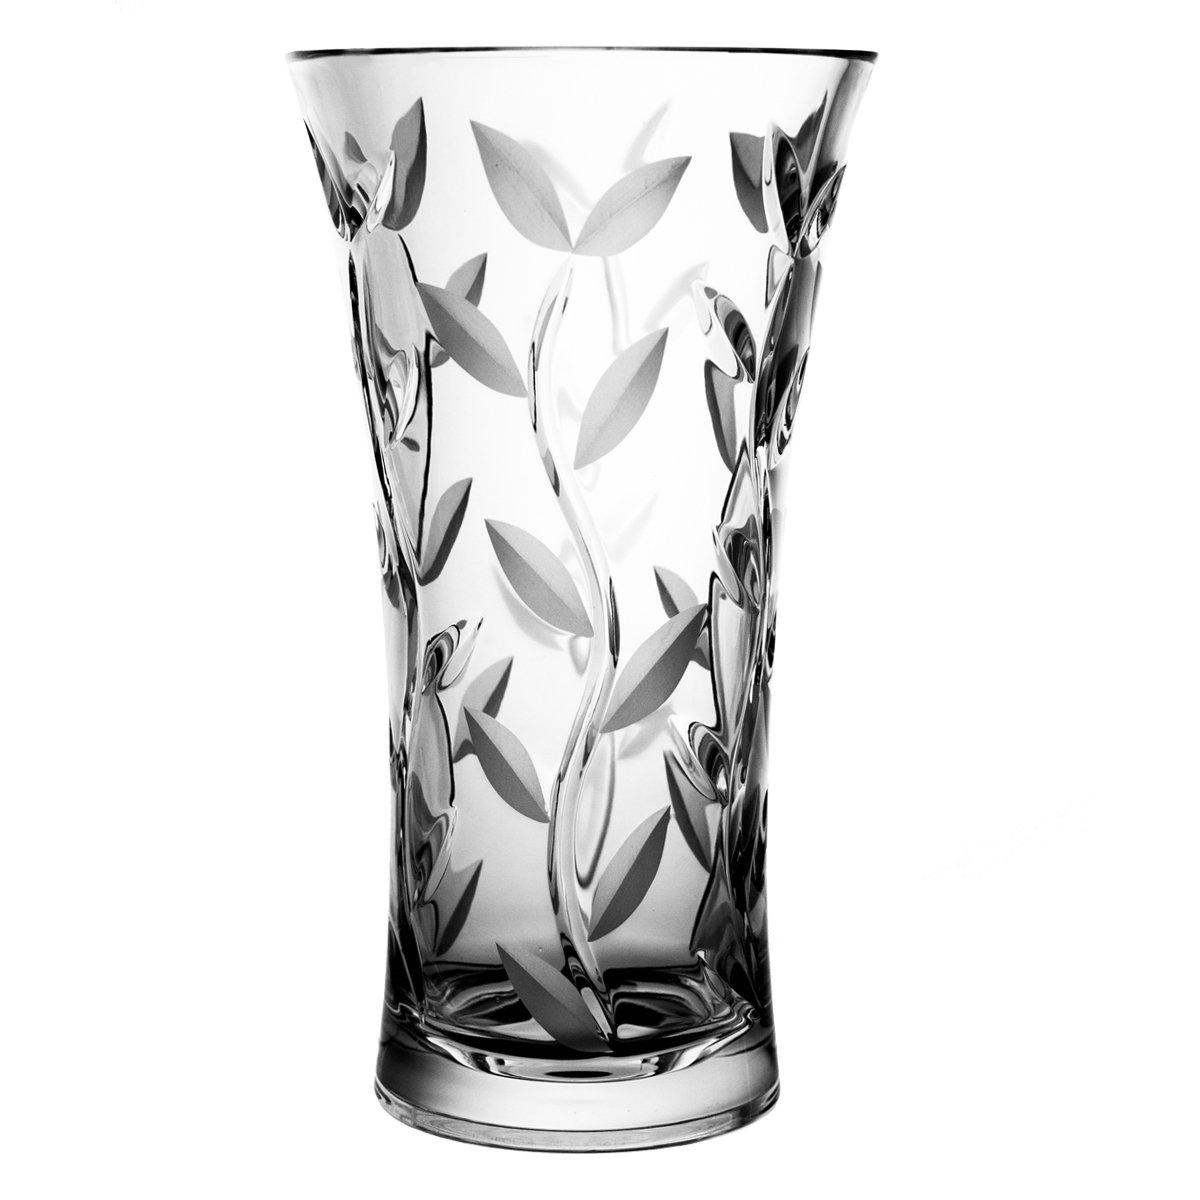 Crystaljulia 9665花瓶、リードクリスタル、25 cm B012A9BSX6